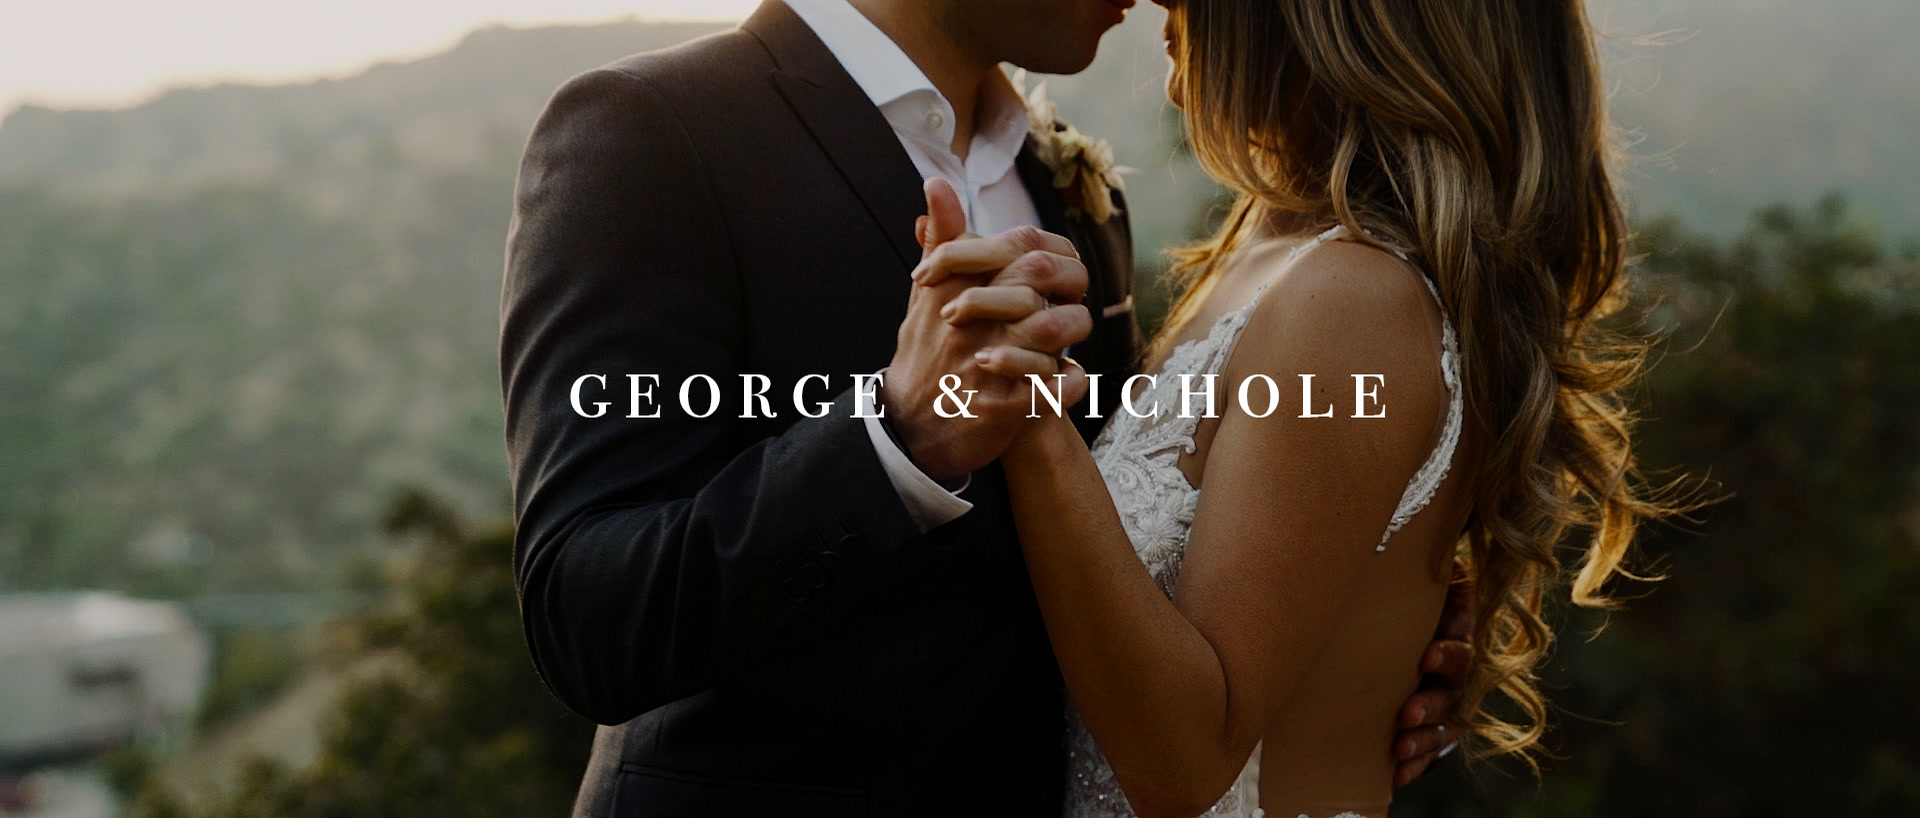 George + Nichole | Pasadena, California | a family home